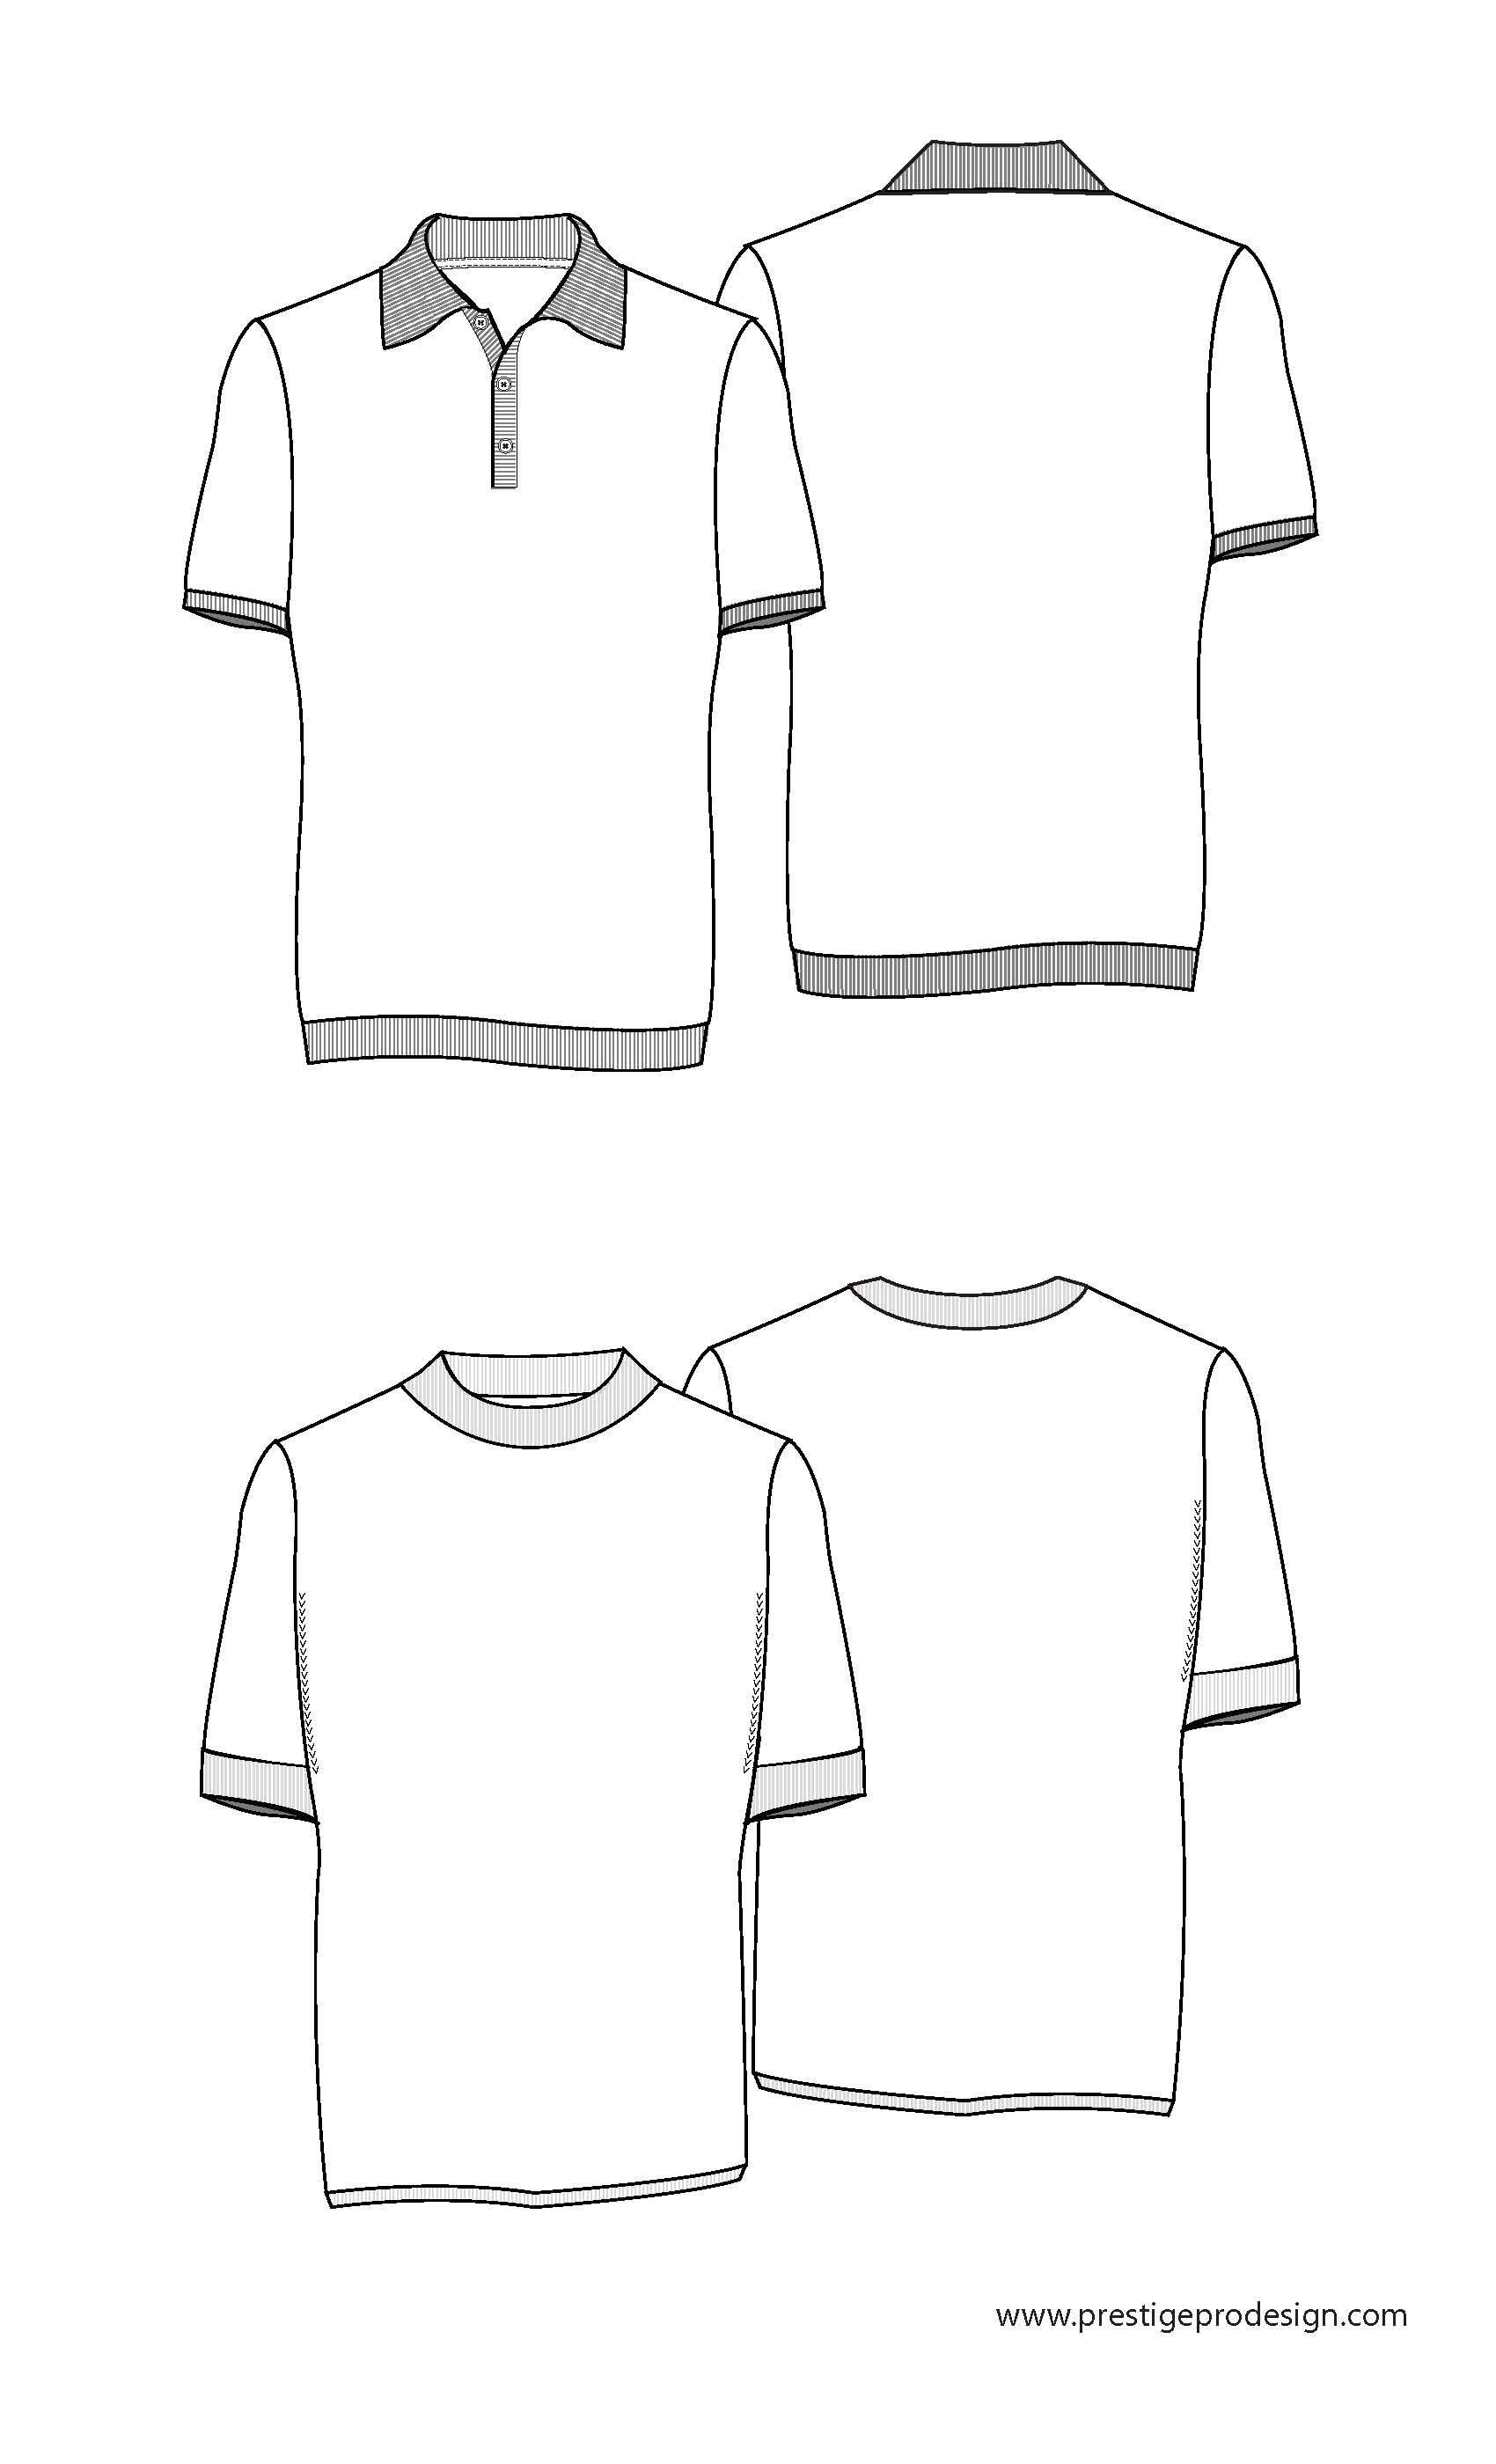 Illustrator Fashion Design Template T Shirt Design Template Fashion Design Template Fashion Portfolio Layout T shirt design template illustrator